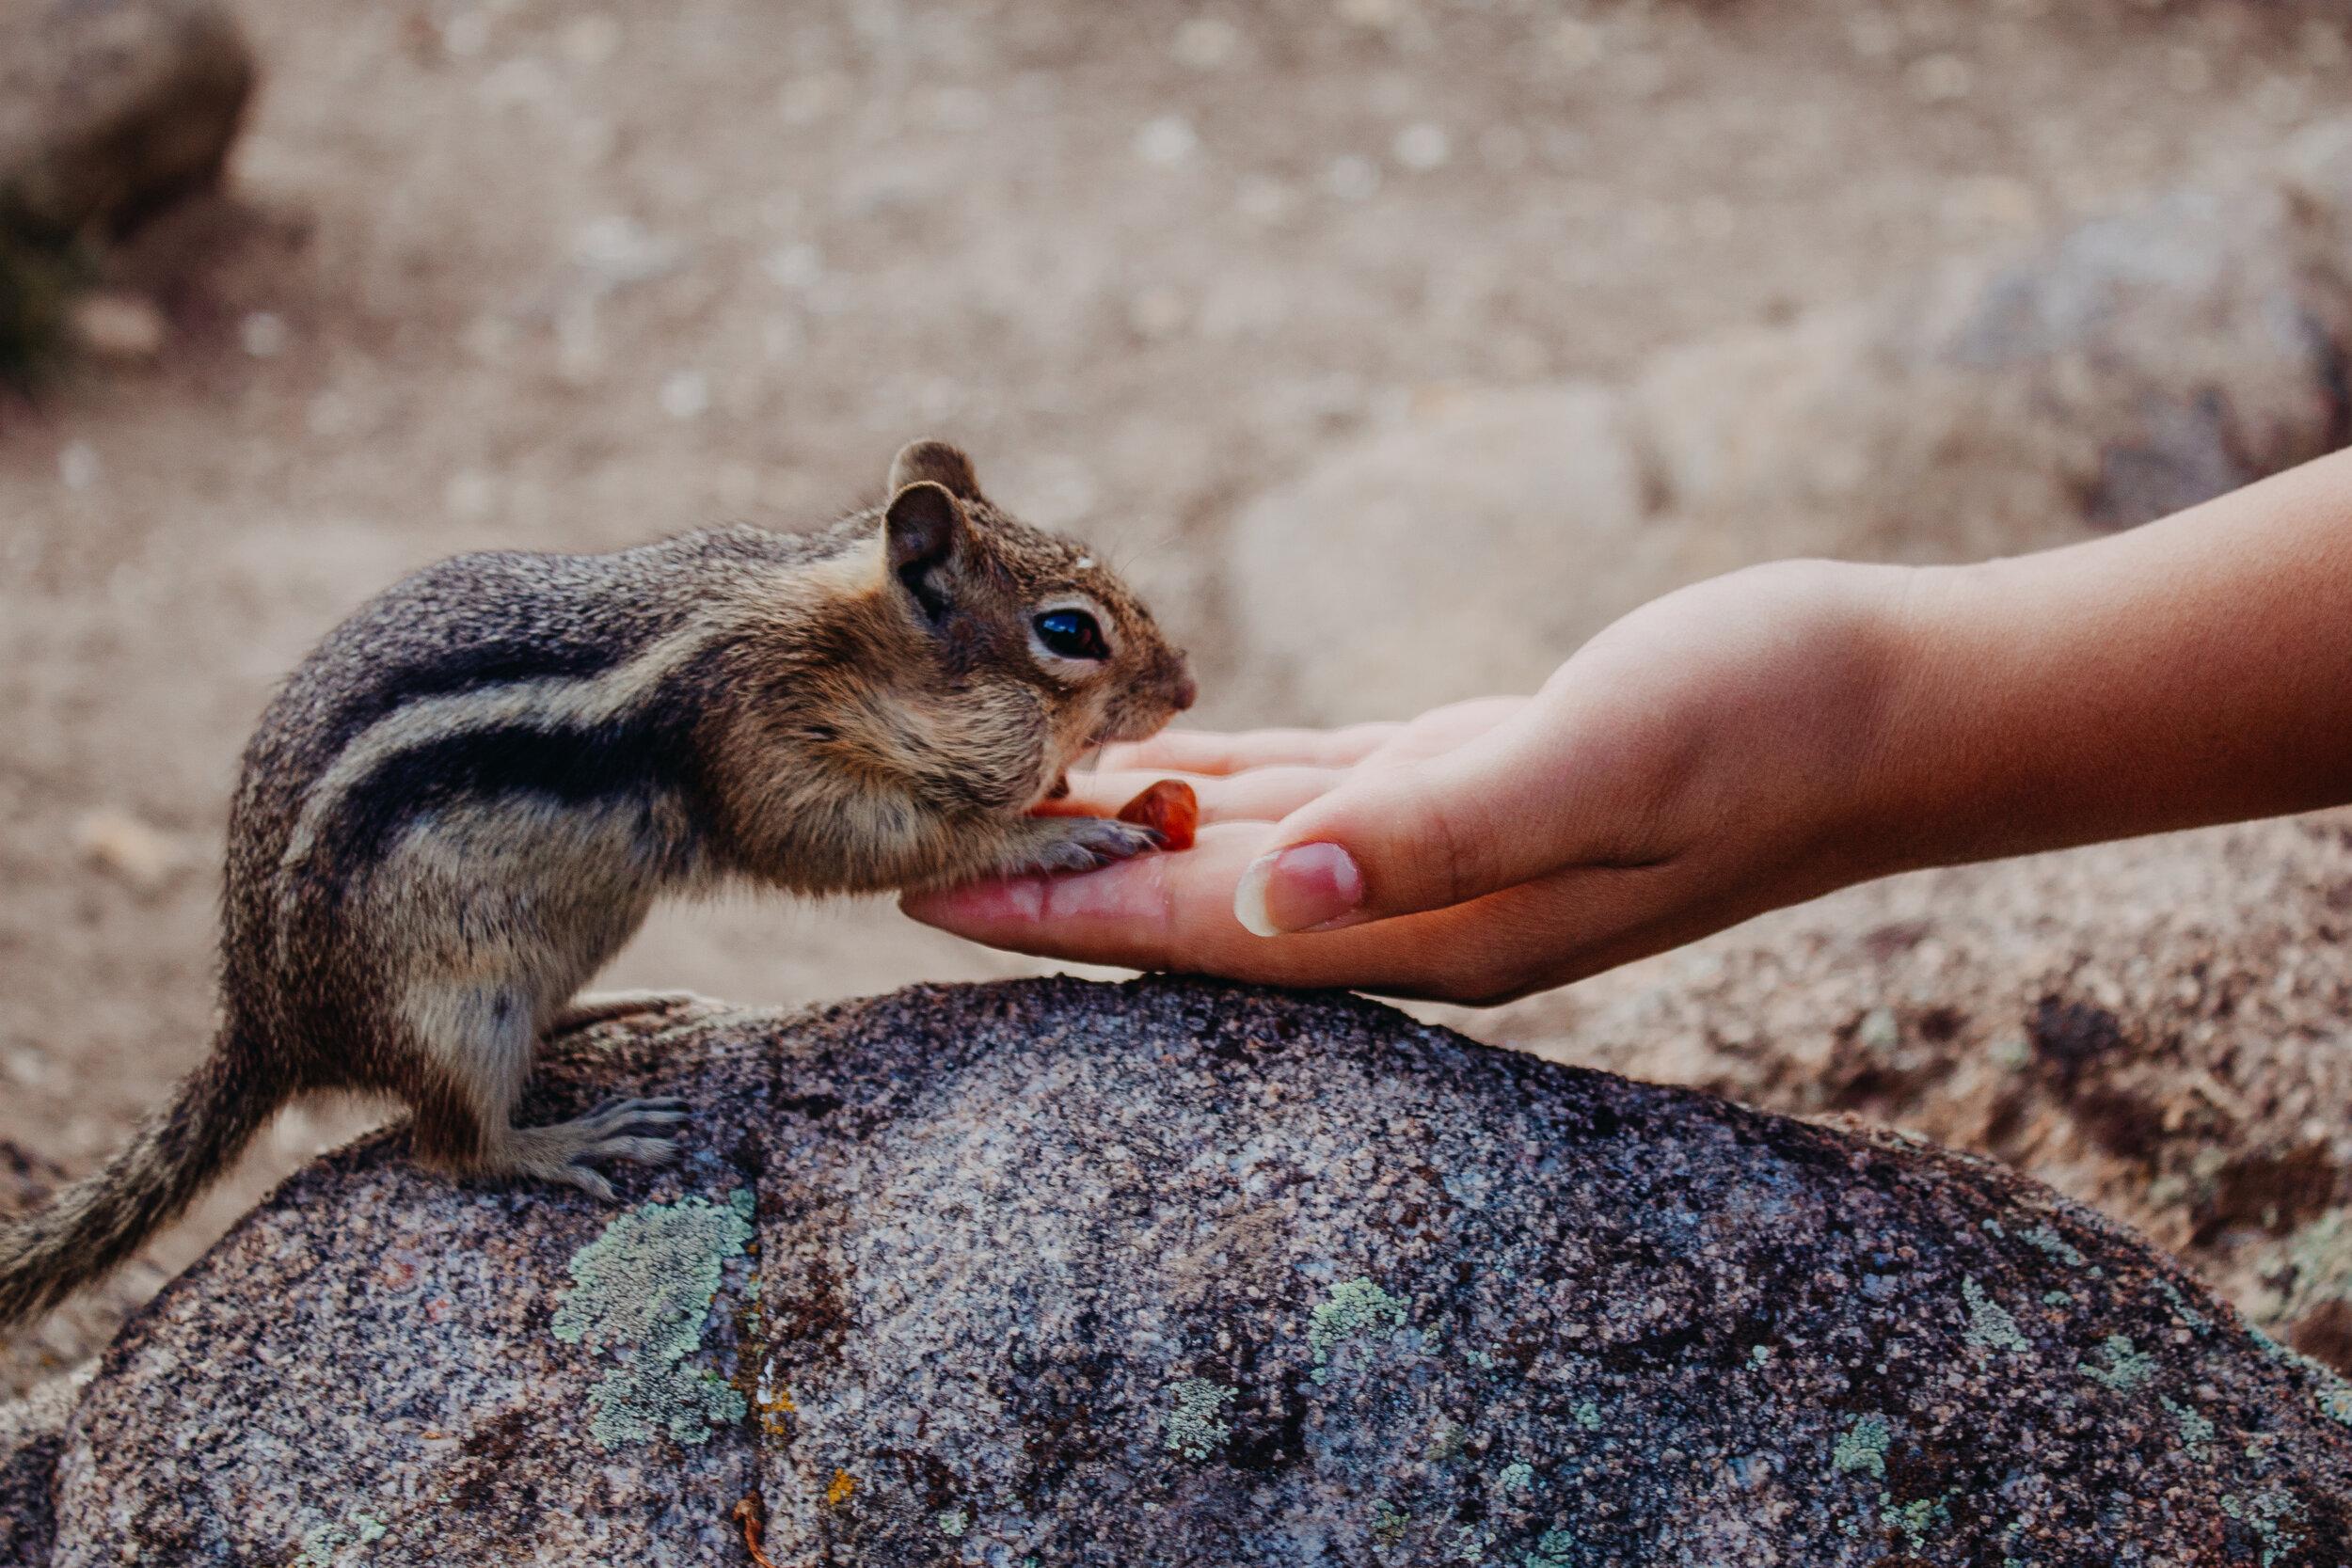 Cute chonky boy grabbing a peanut